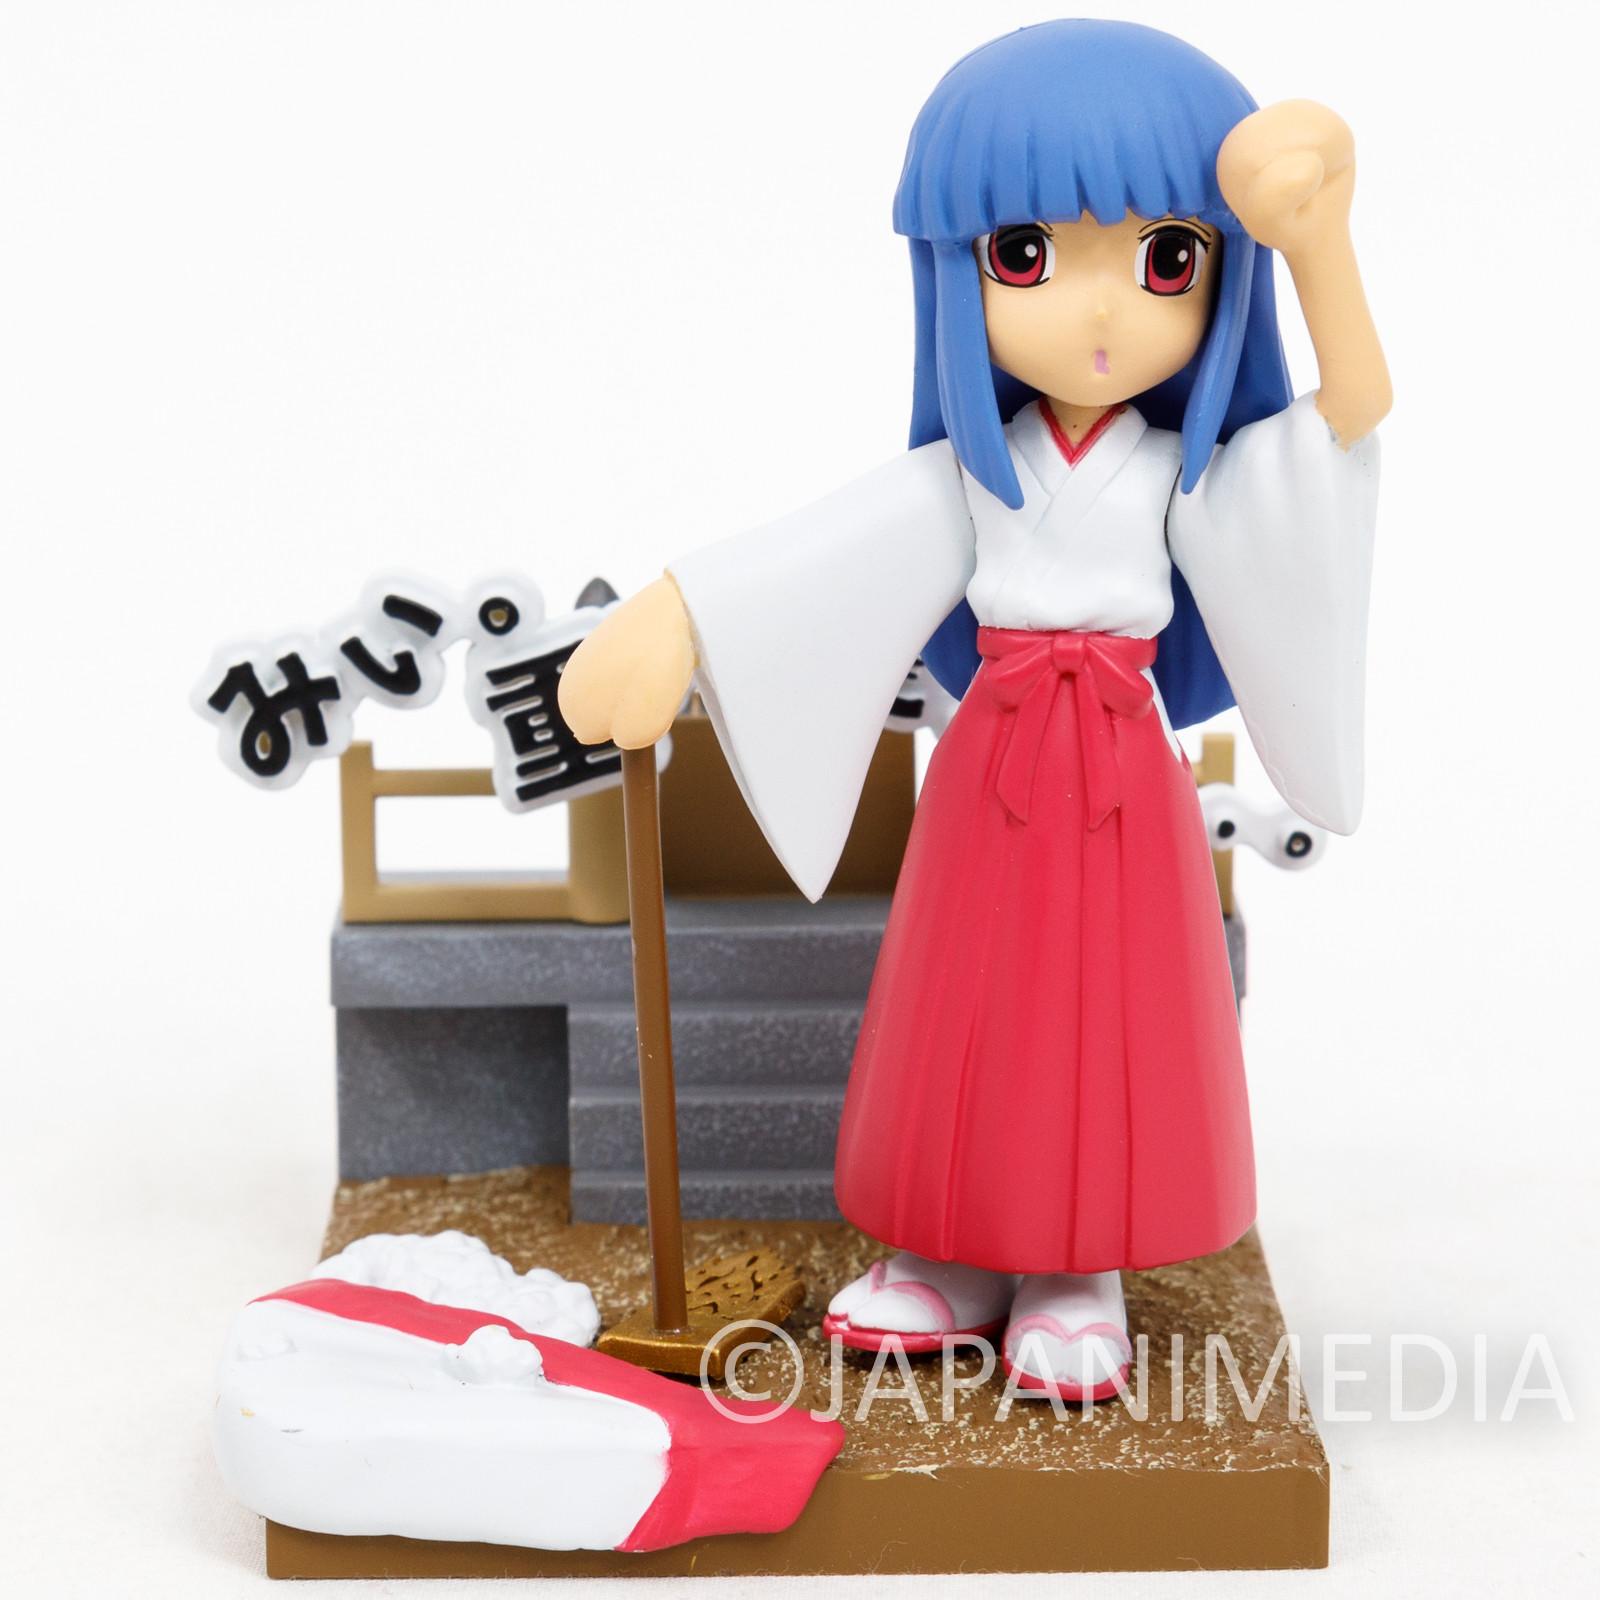 When They Cry Higurashi no Nakukoroni Rika Furude Miniature Diorama Figure